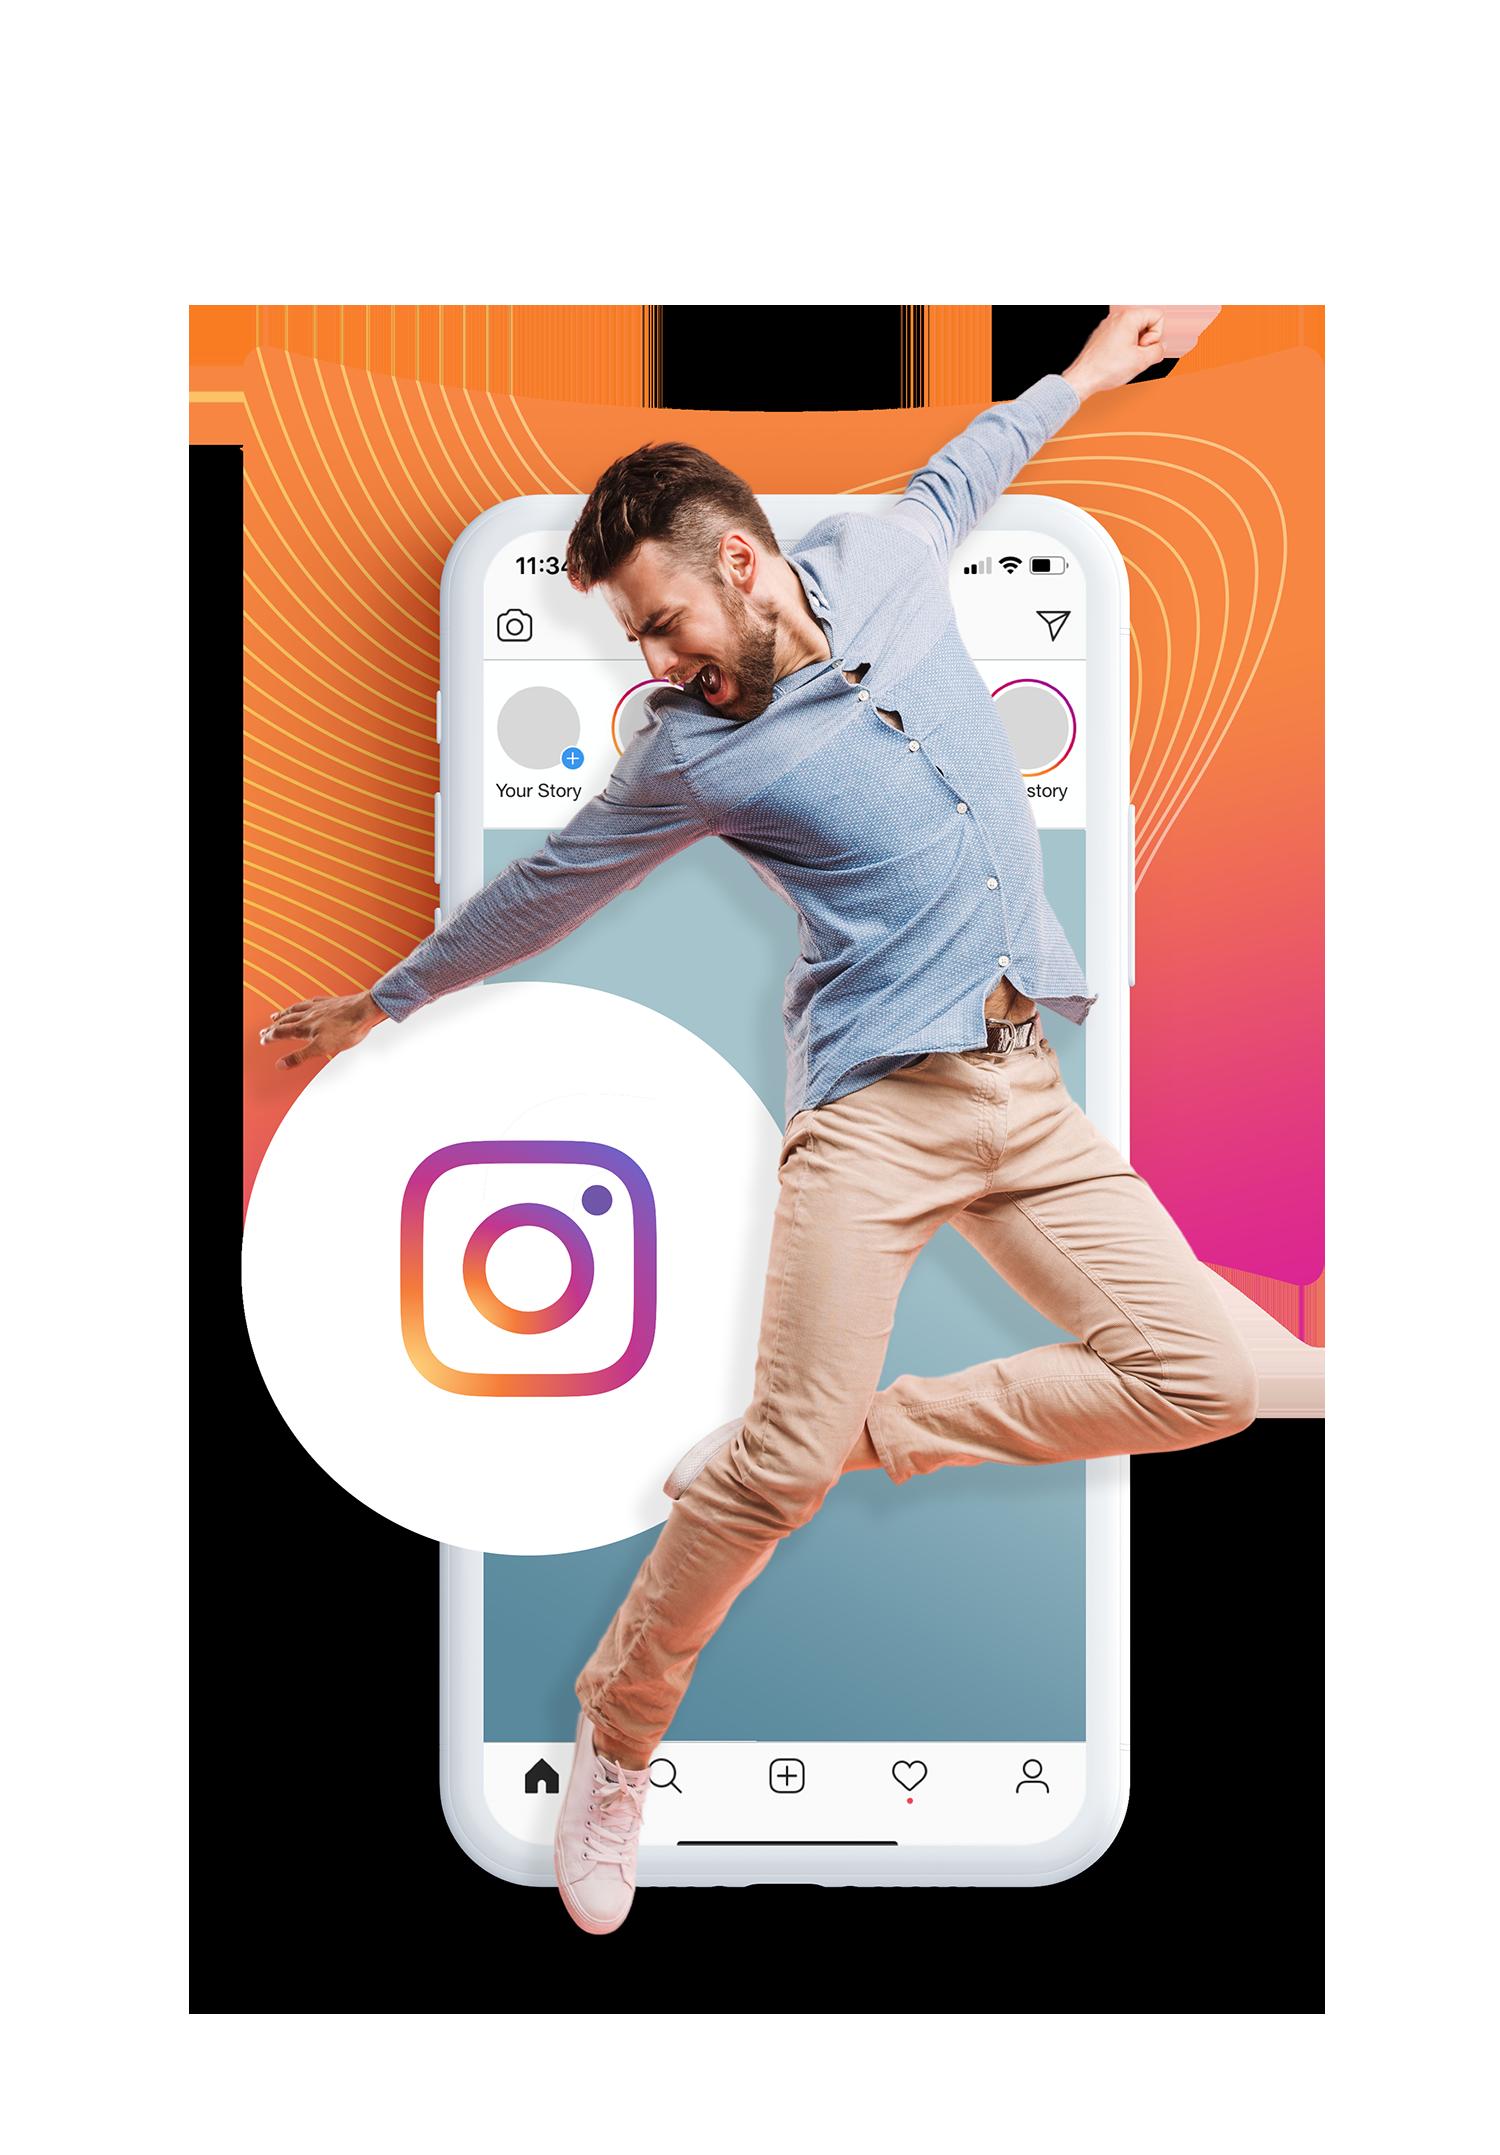 instagram izea phone man jump